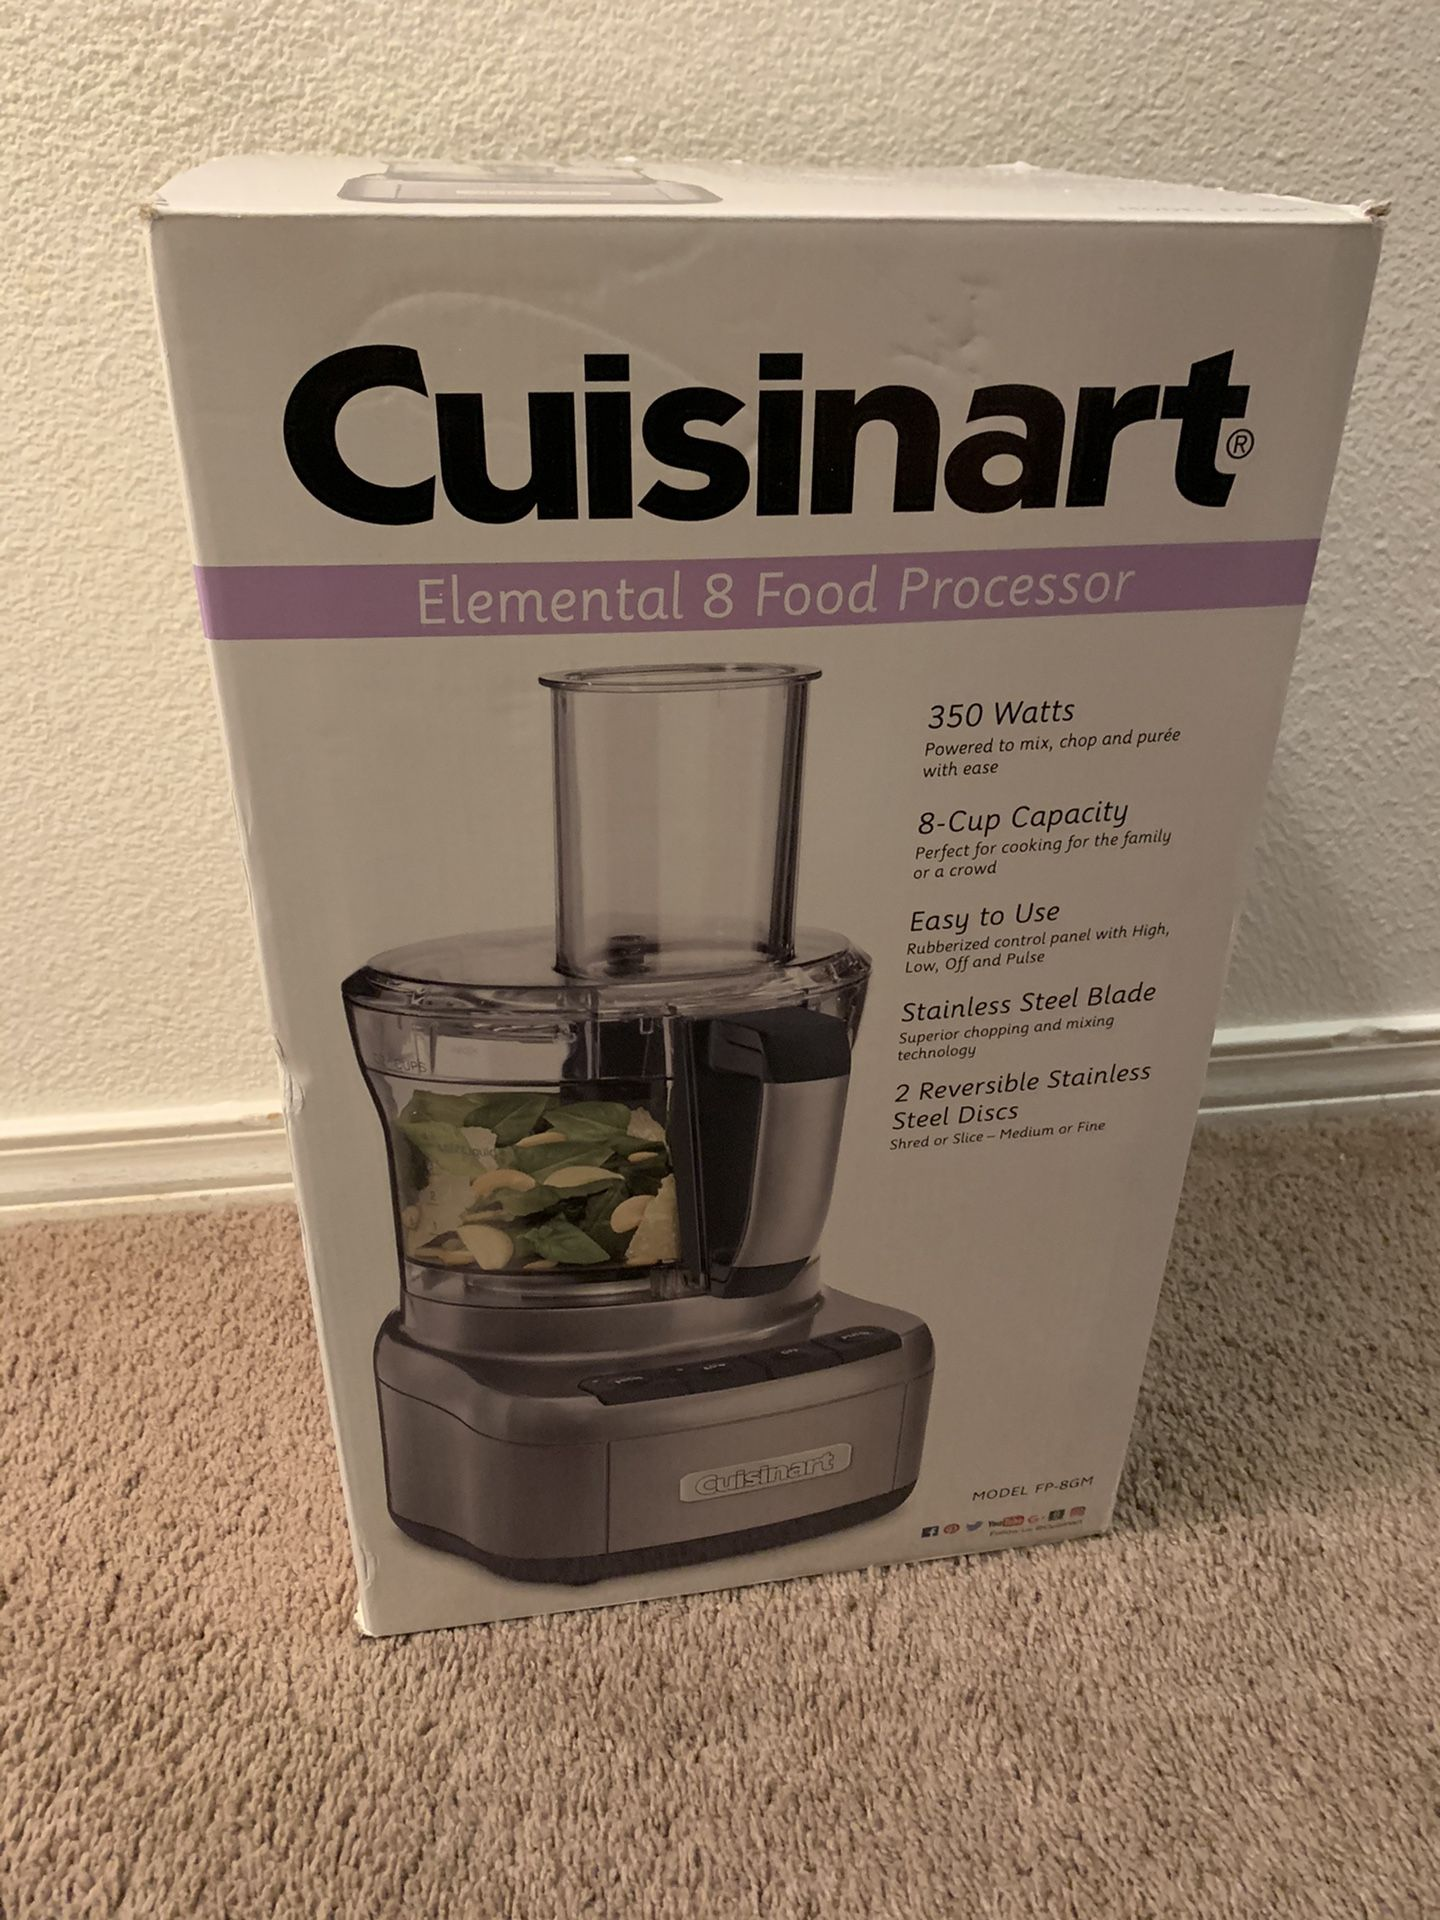 Cuisinart, Elemental 8 food processor